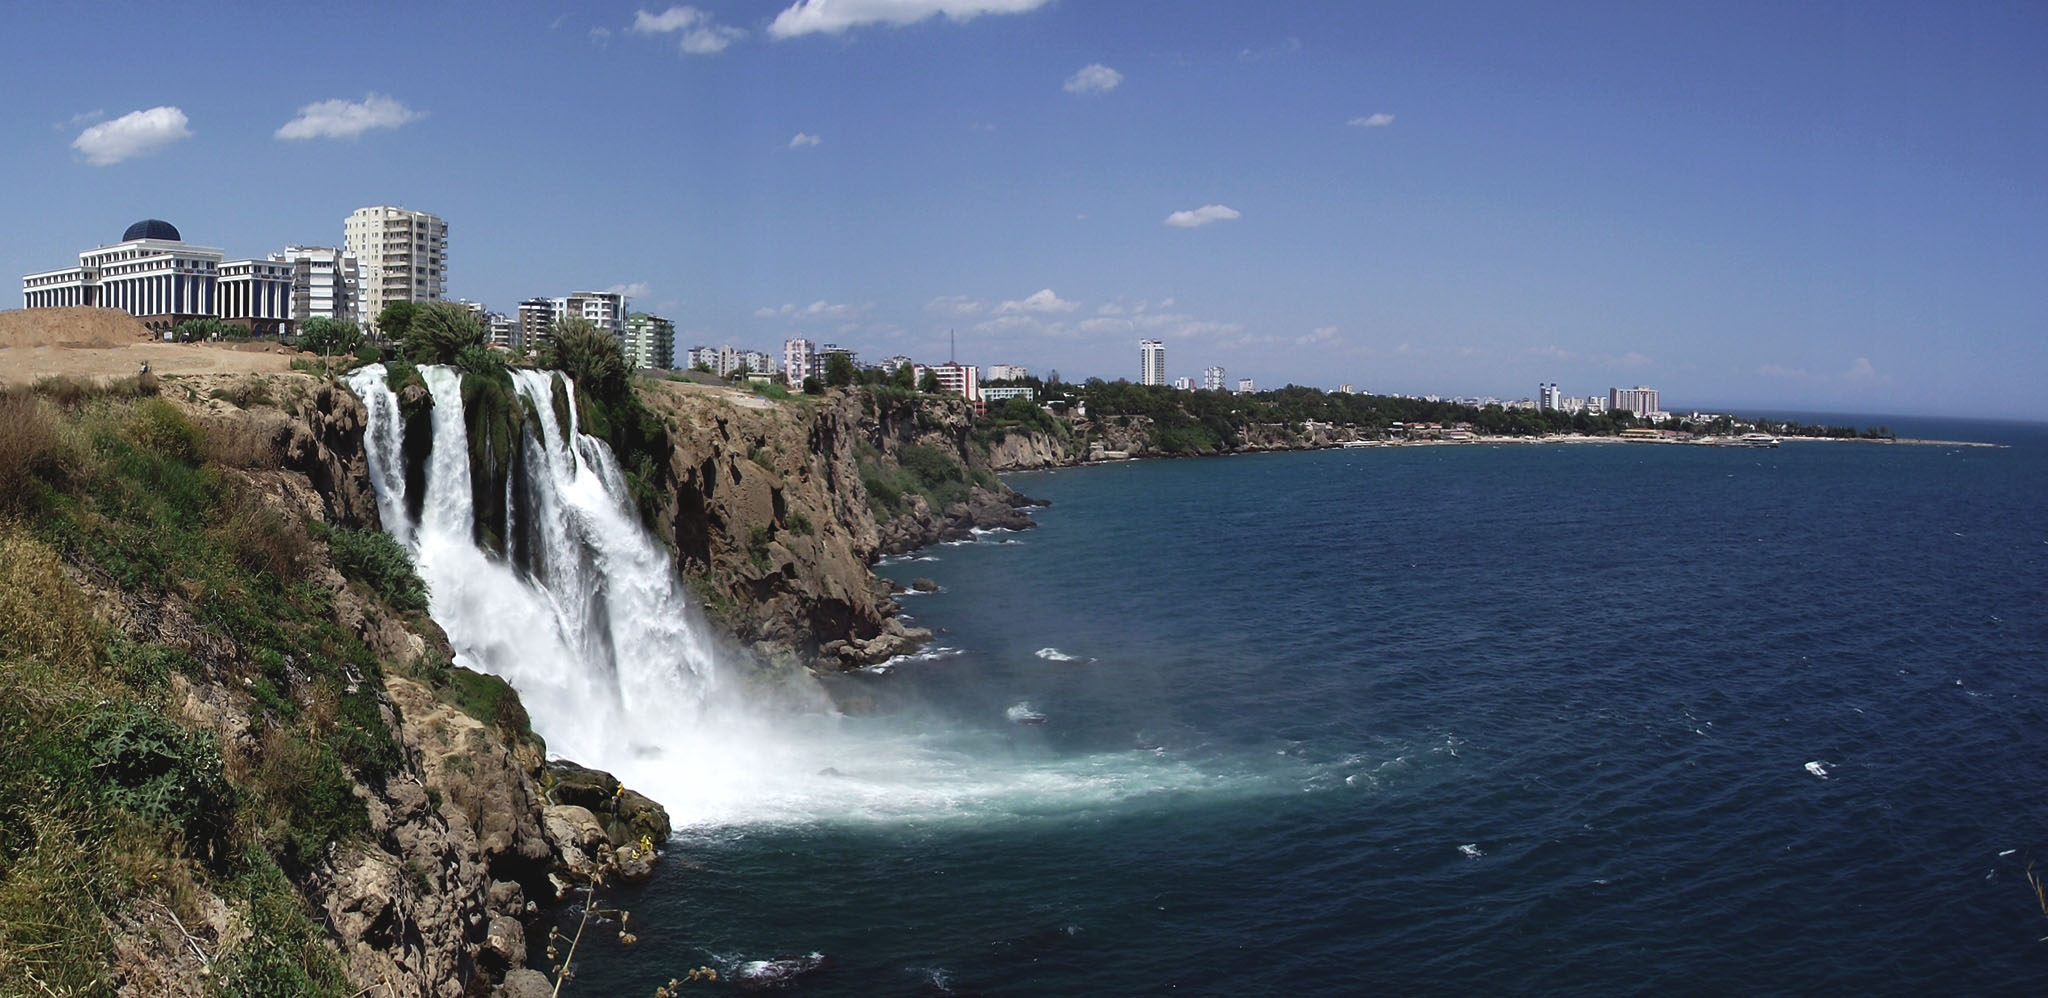 La chute de Karpuzkaldiran située dans la ville d'Antalya en Turquie.